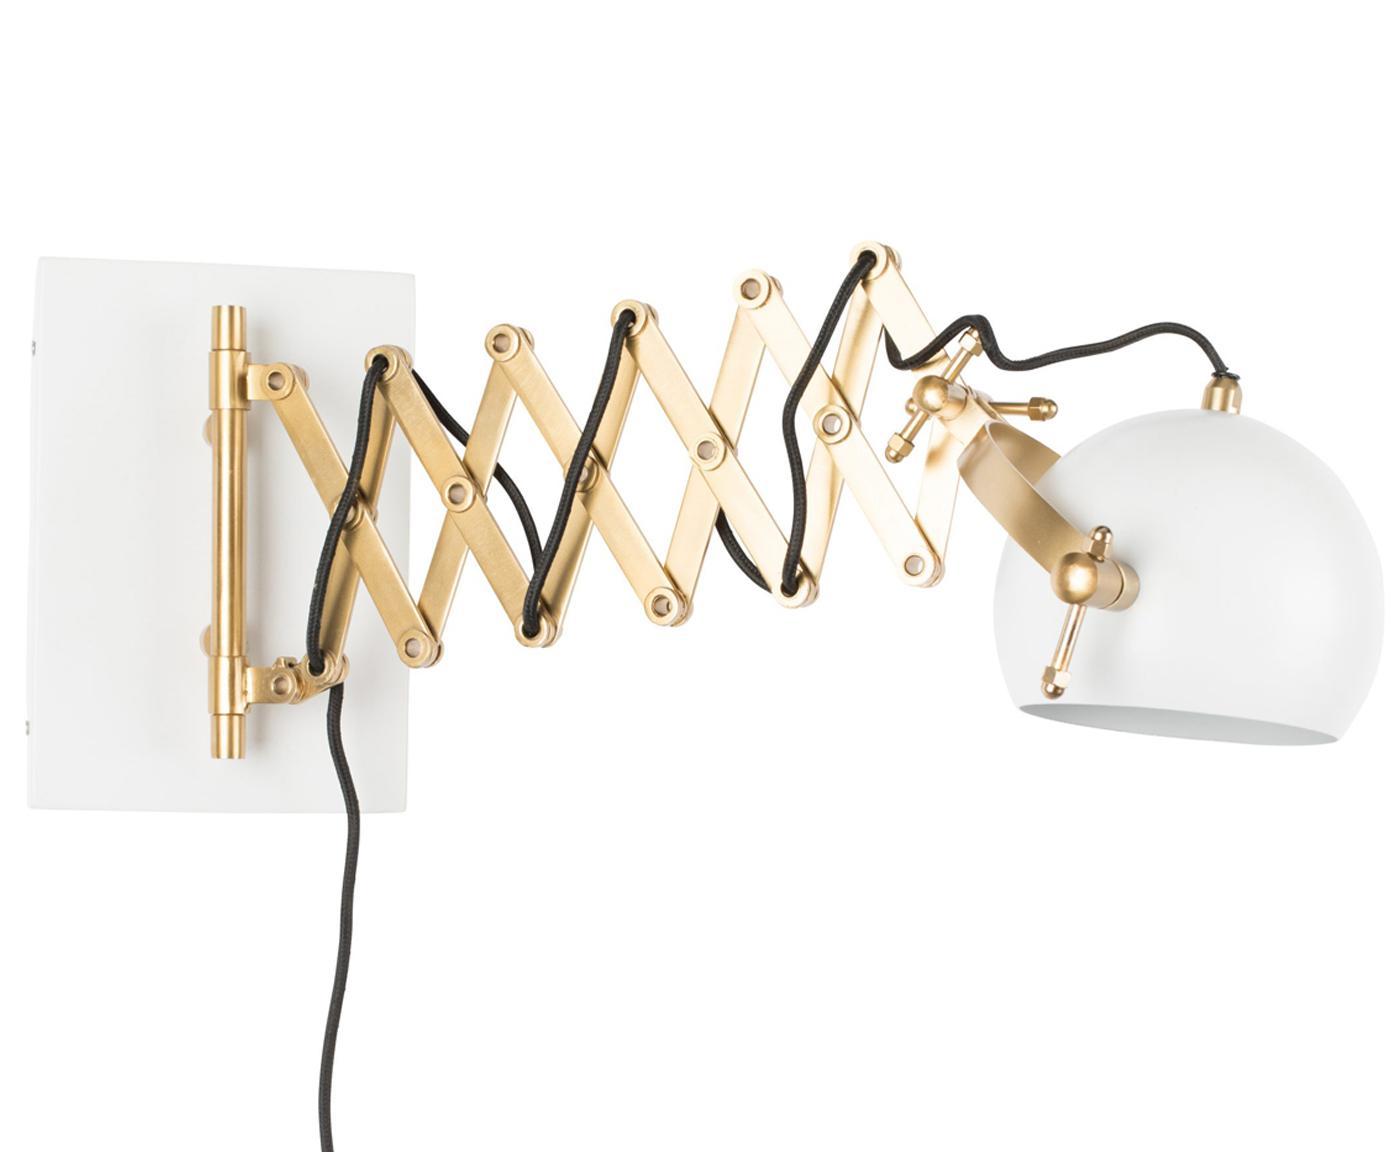 Wandleuchte Sarana, Leuchte: Metall, pulverbeschichtet, Messingfarben, Weiss, B 17 x T 36 bis 64 cm